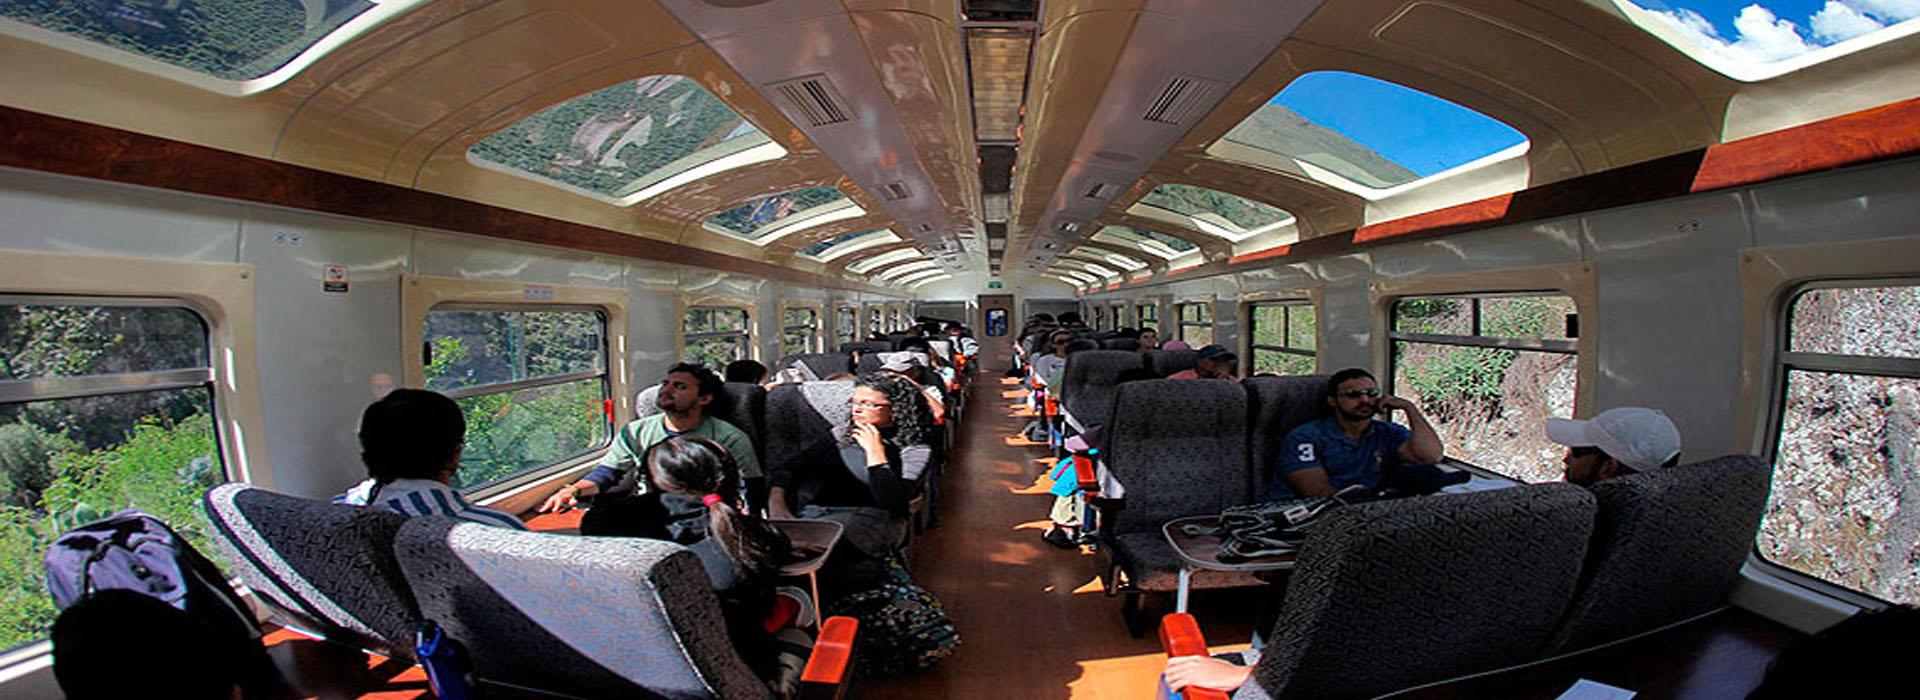 Machupicchu by Tren 1 day